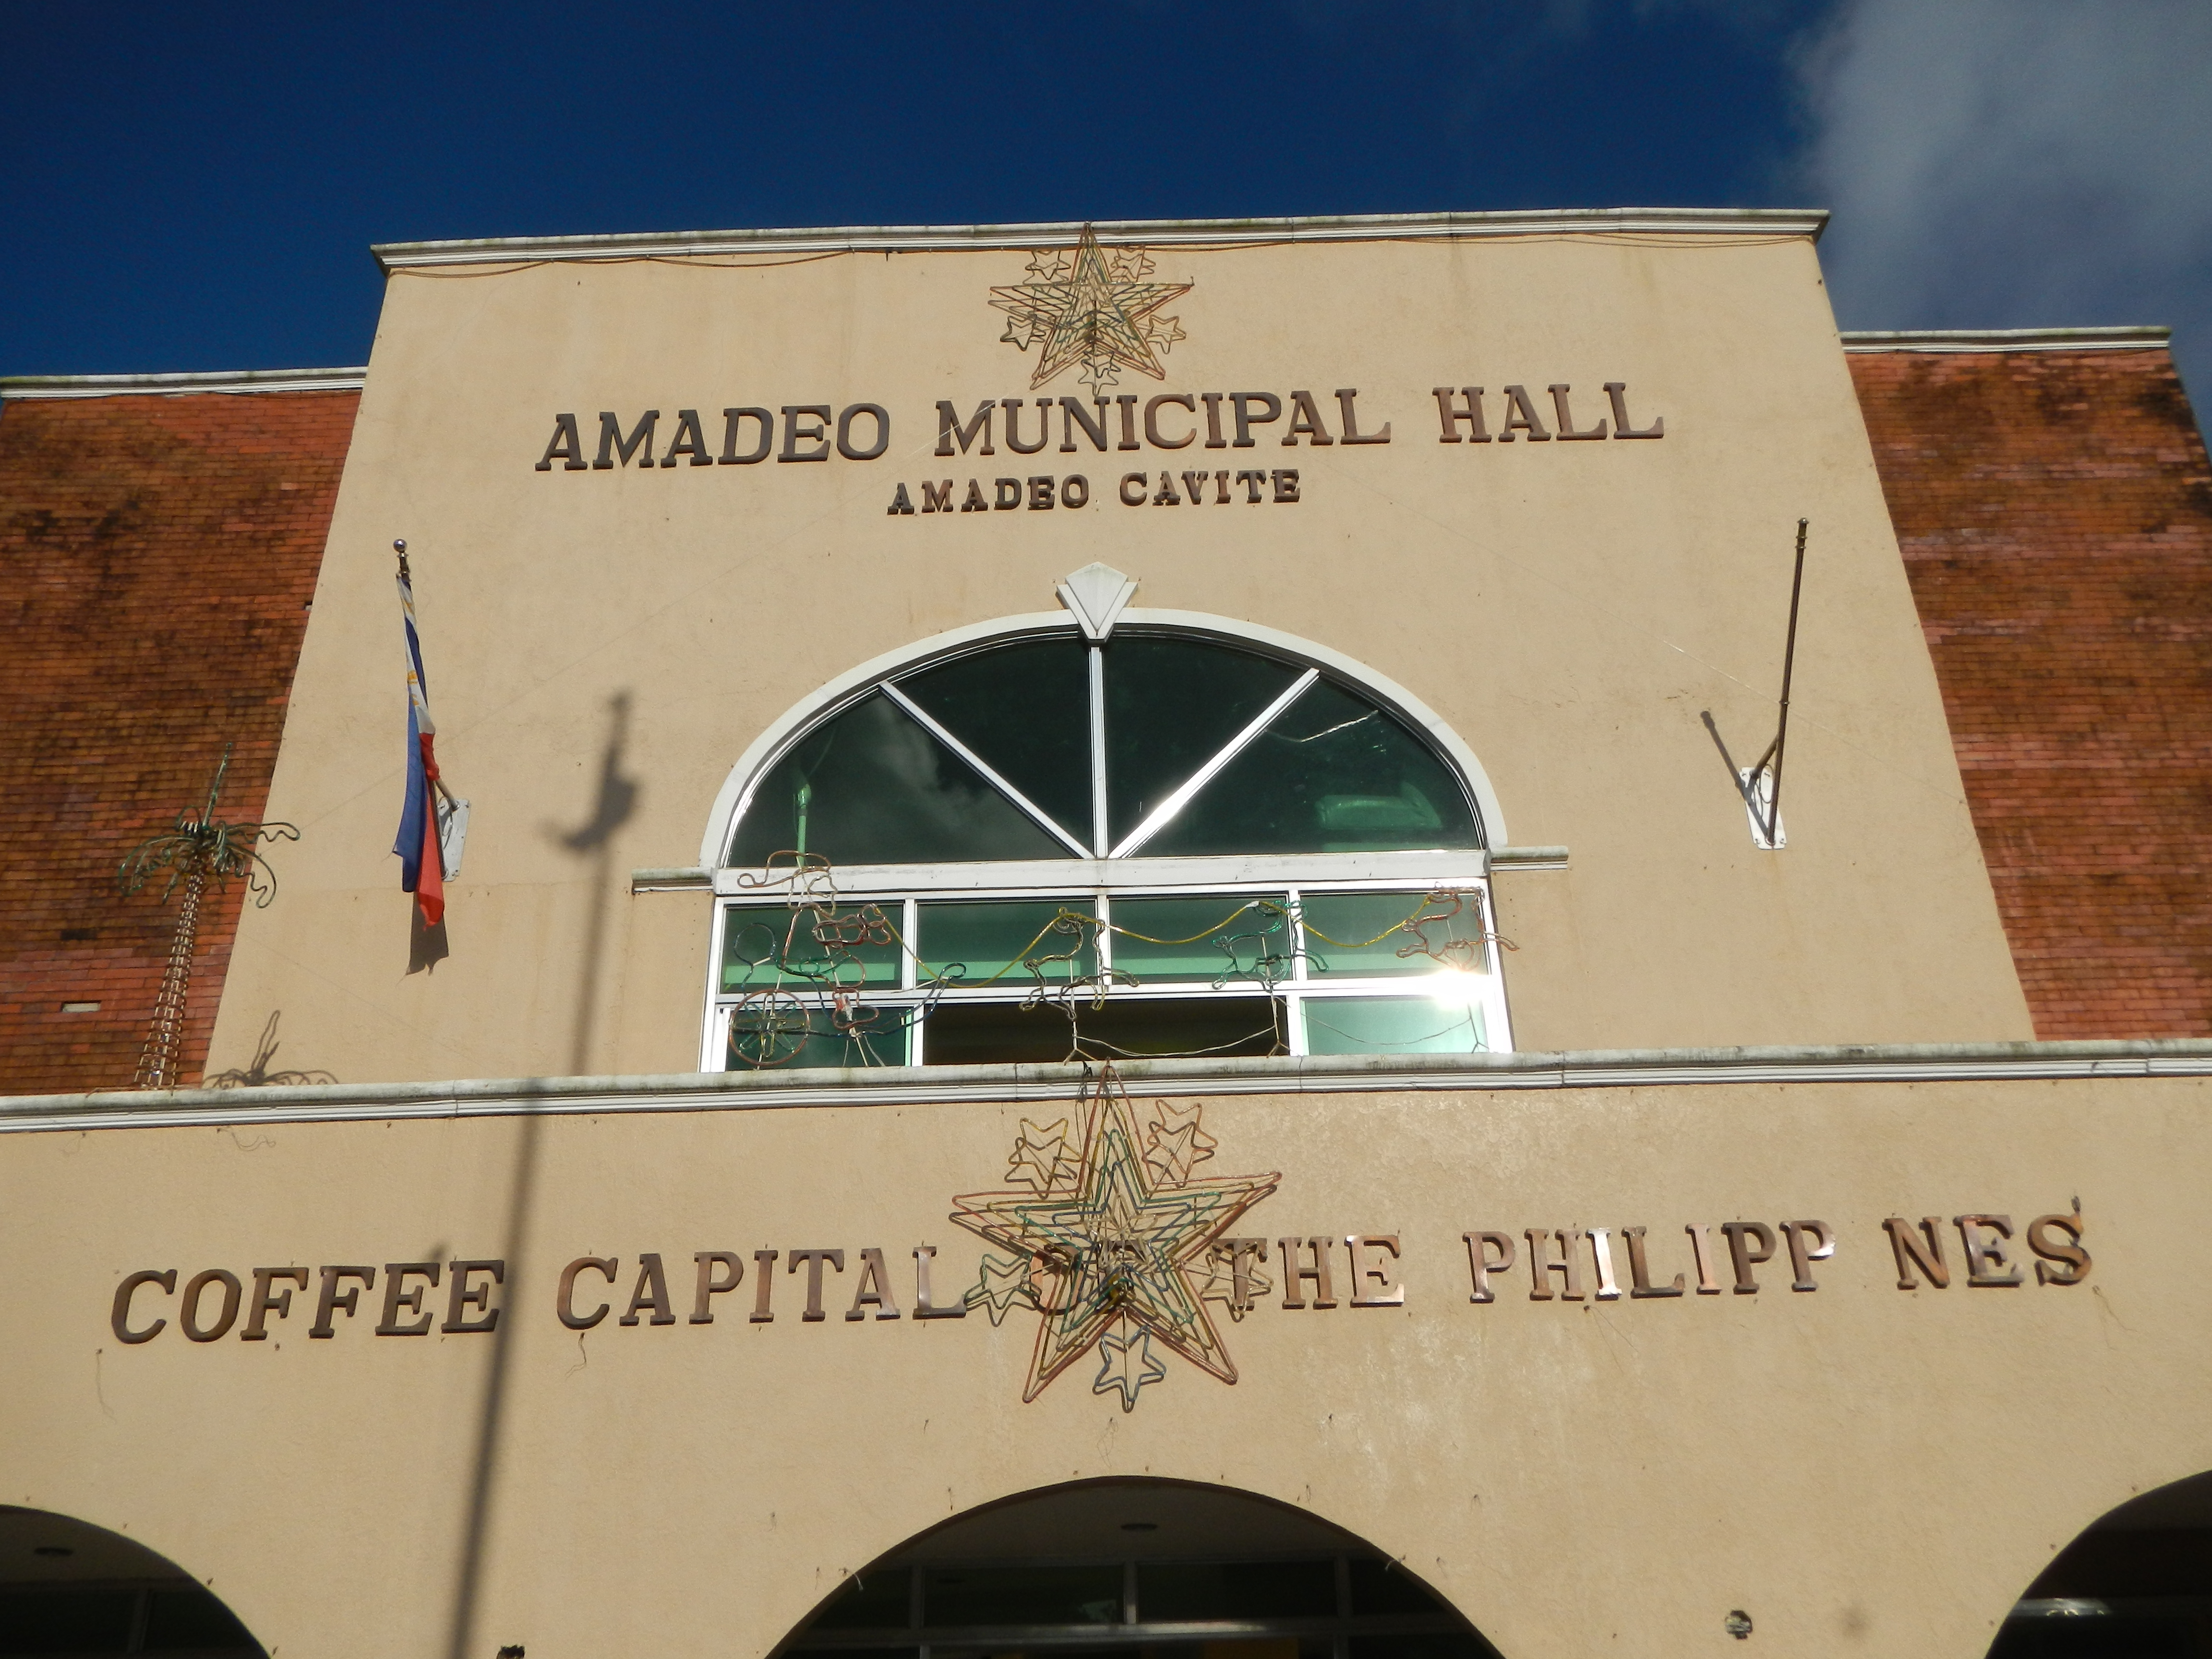 Amadeo (Cavite)